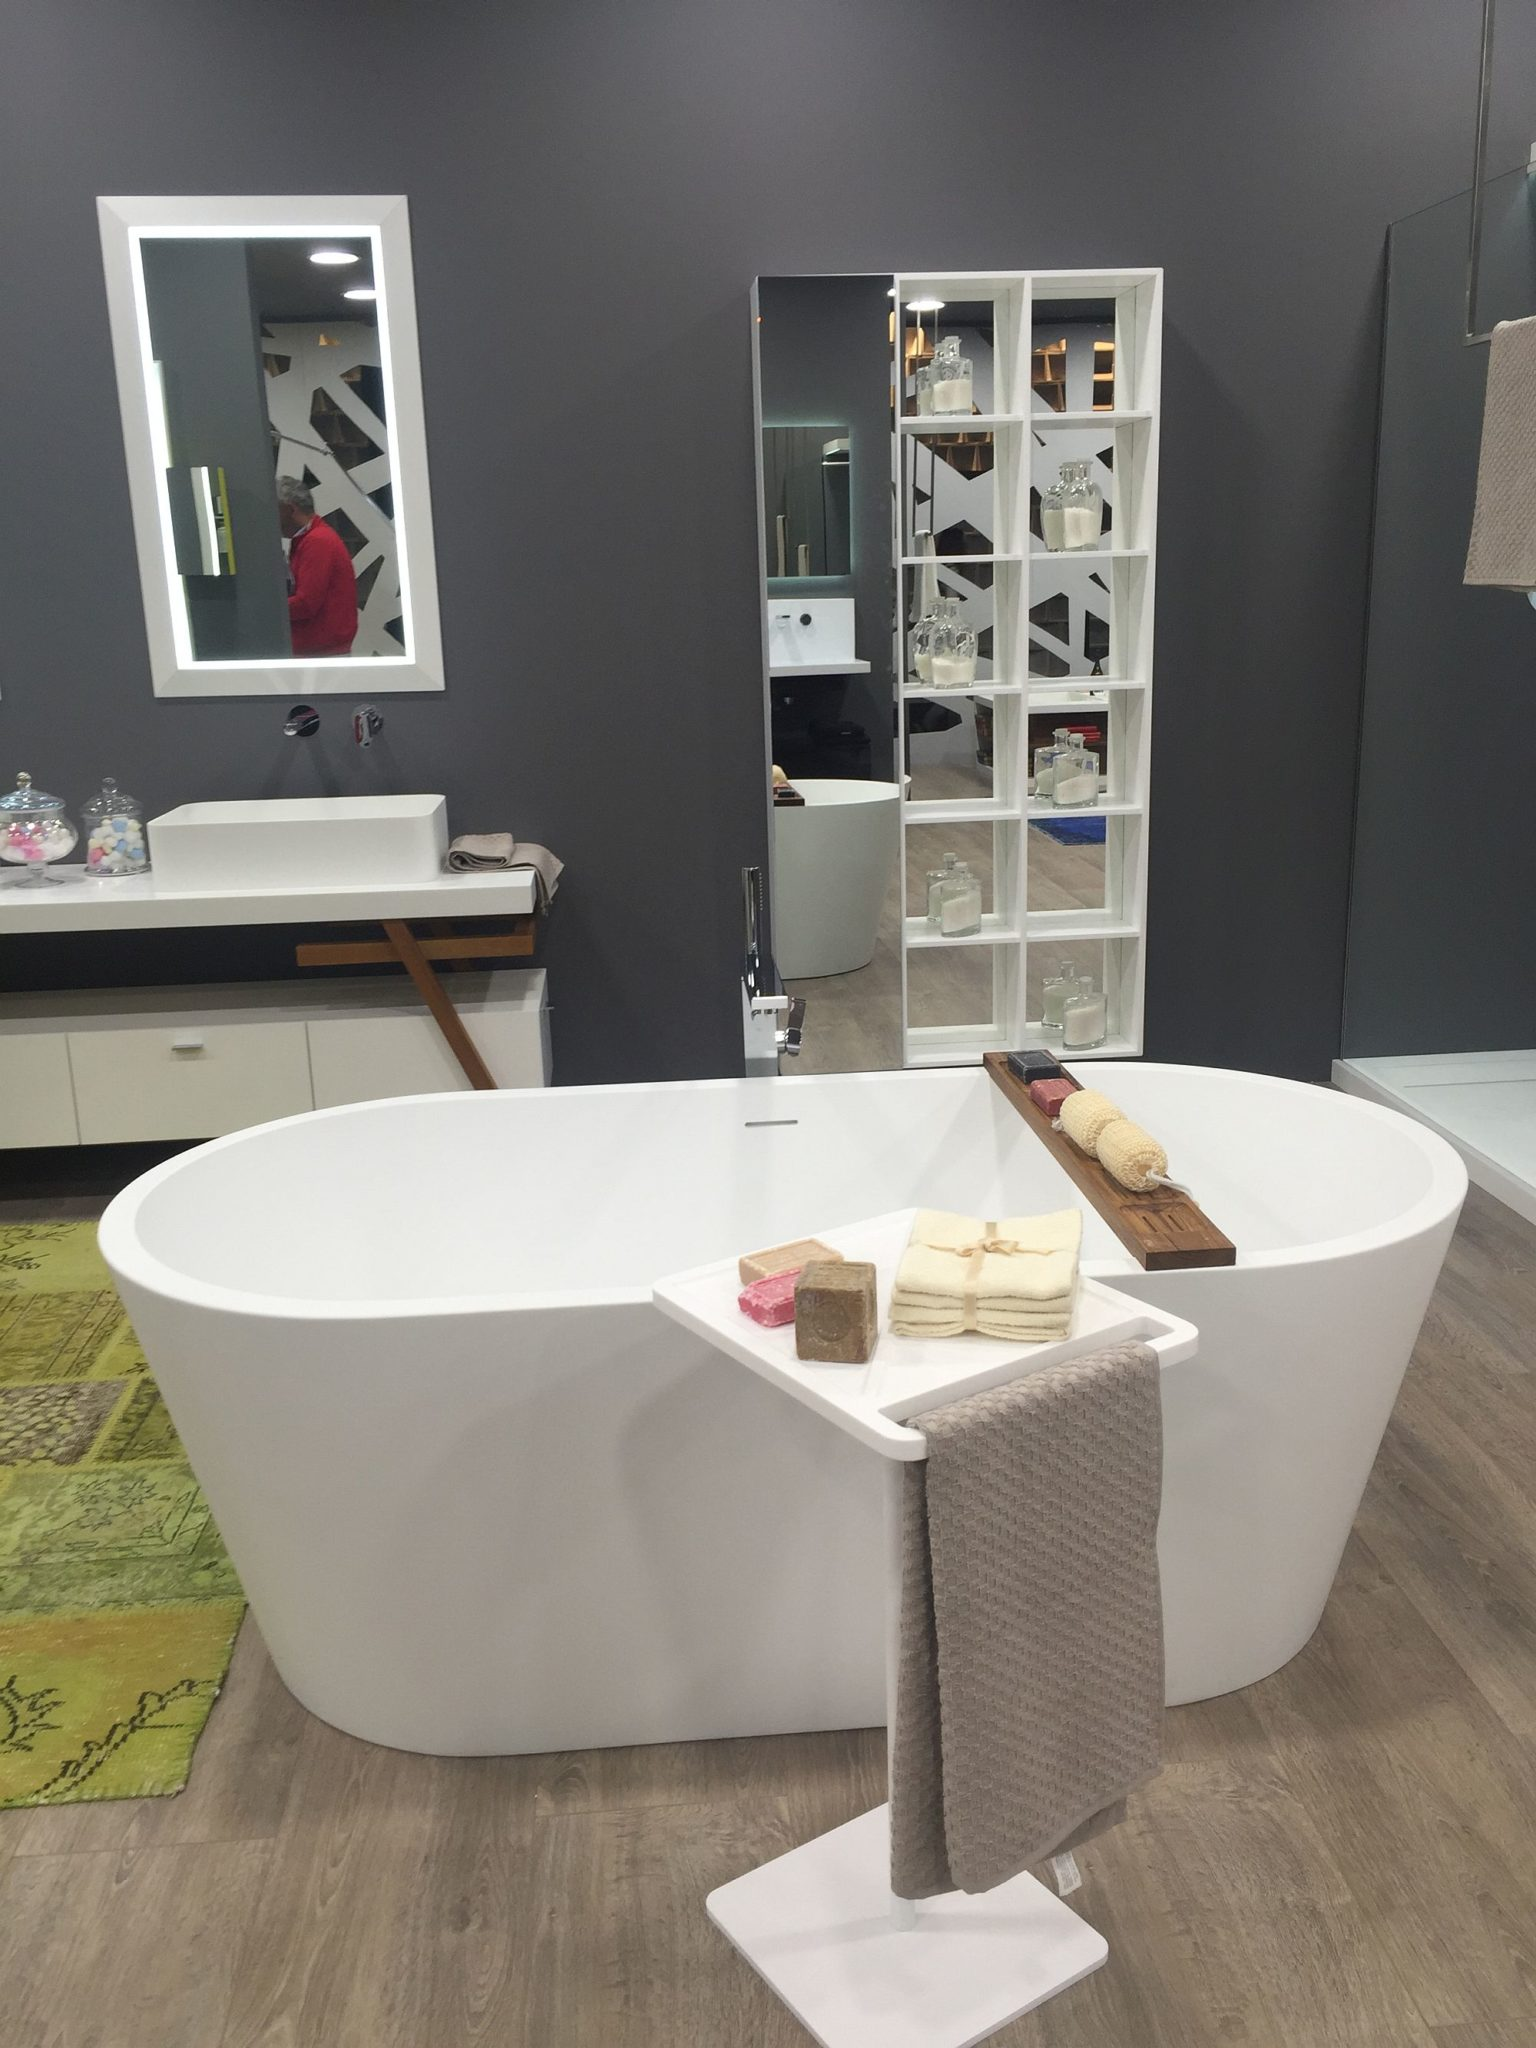 20 towel display ideas for contemporary bathrooms. Black Bedroom Furniture Sets. Home Design Ideas